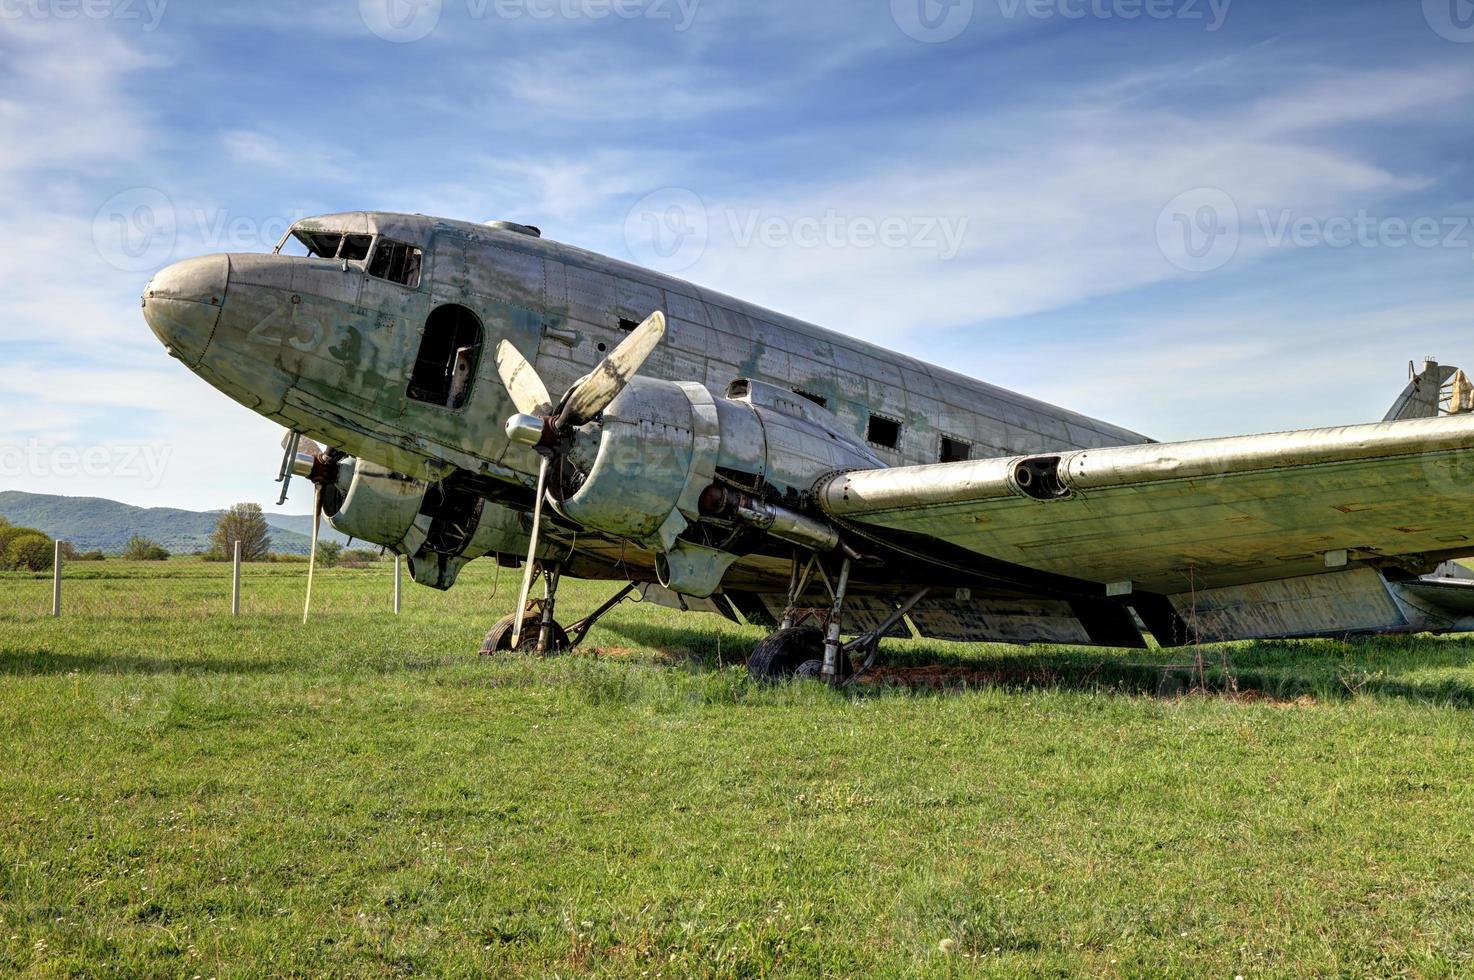 altes verlassenes Douglas DC-3 Flugzeug foto